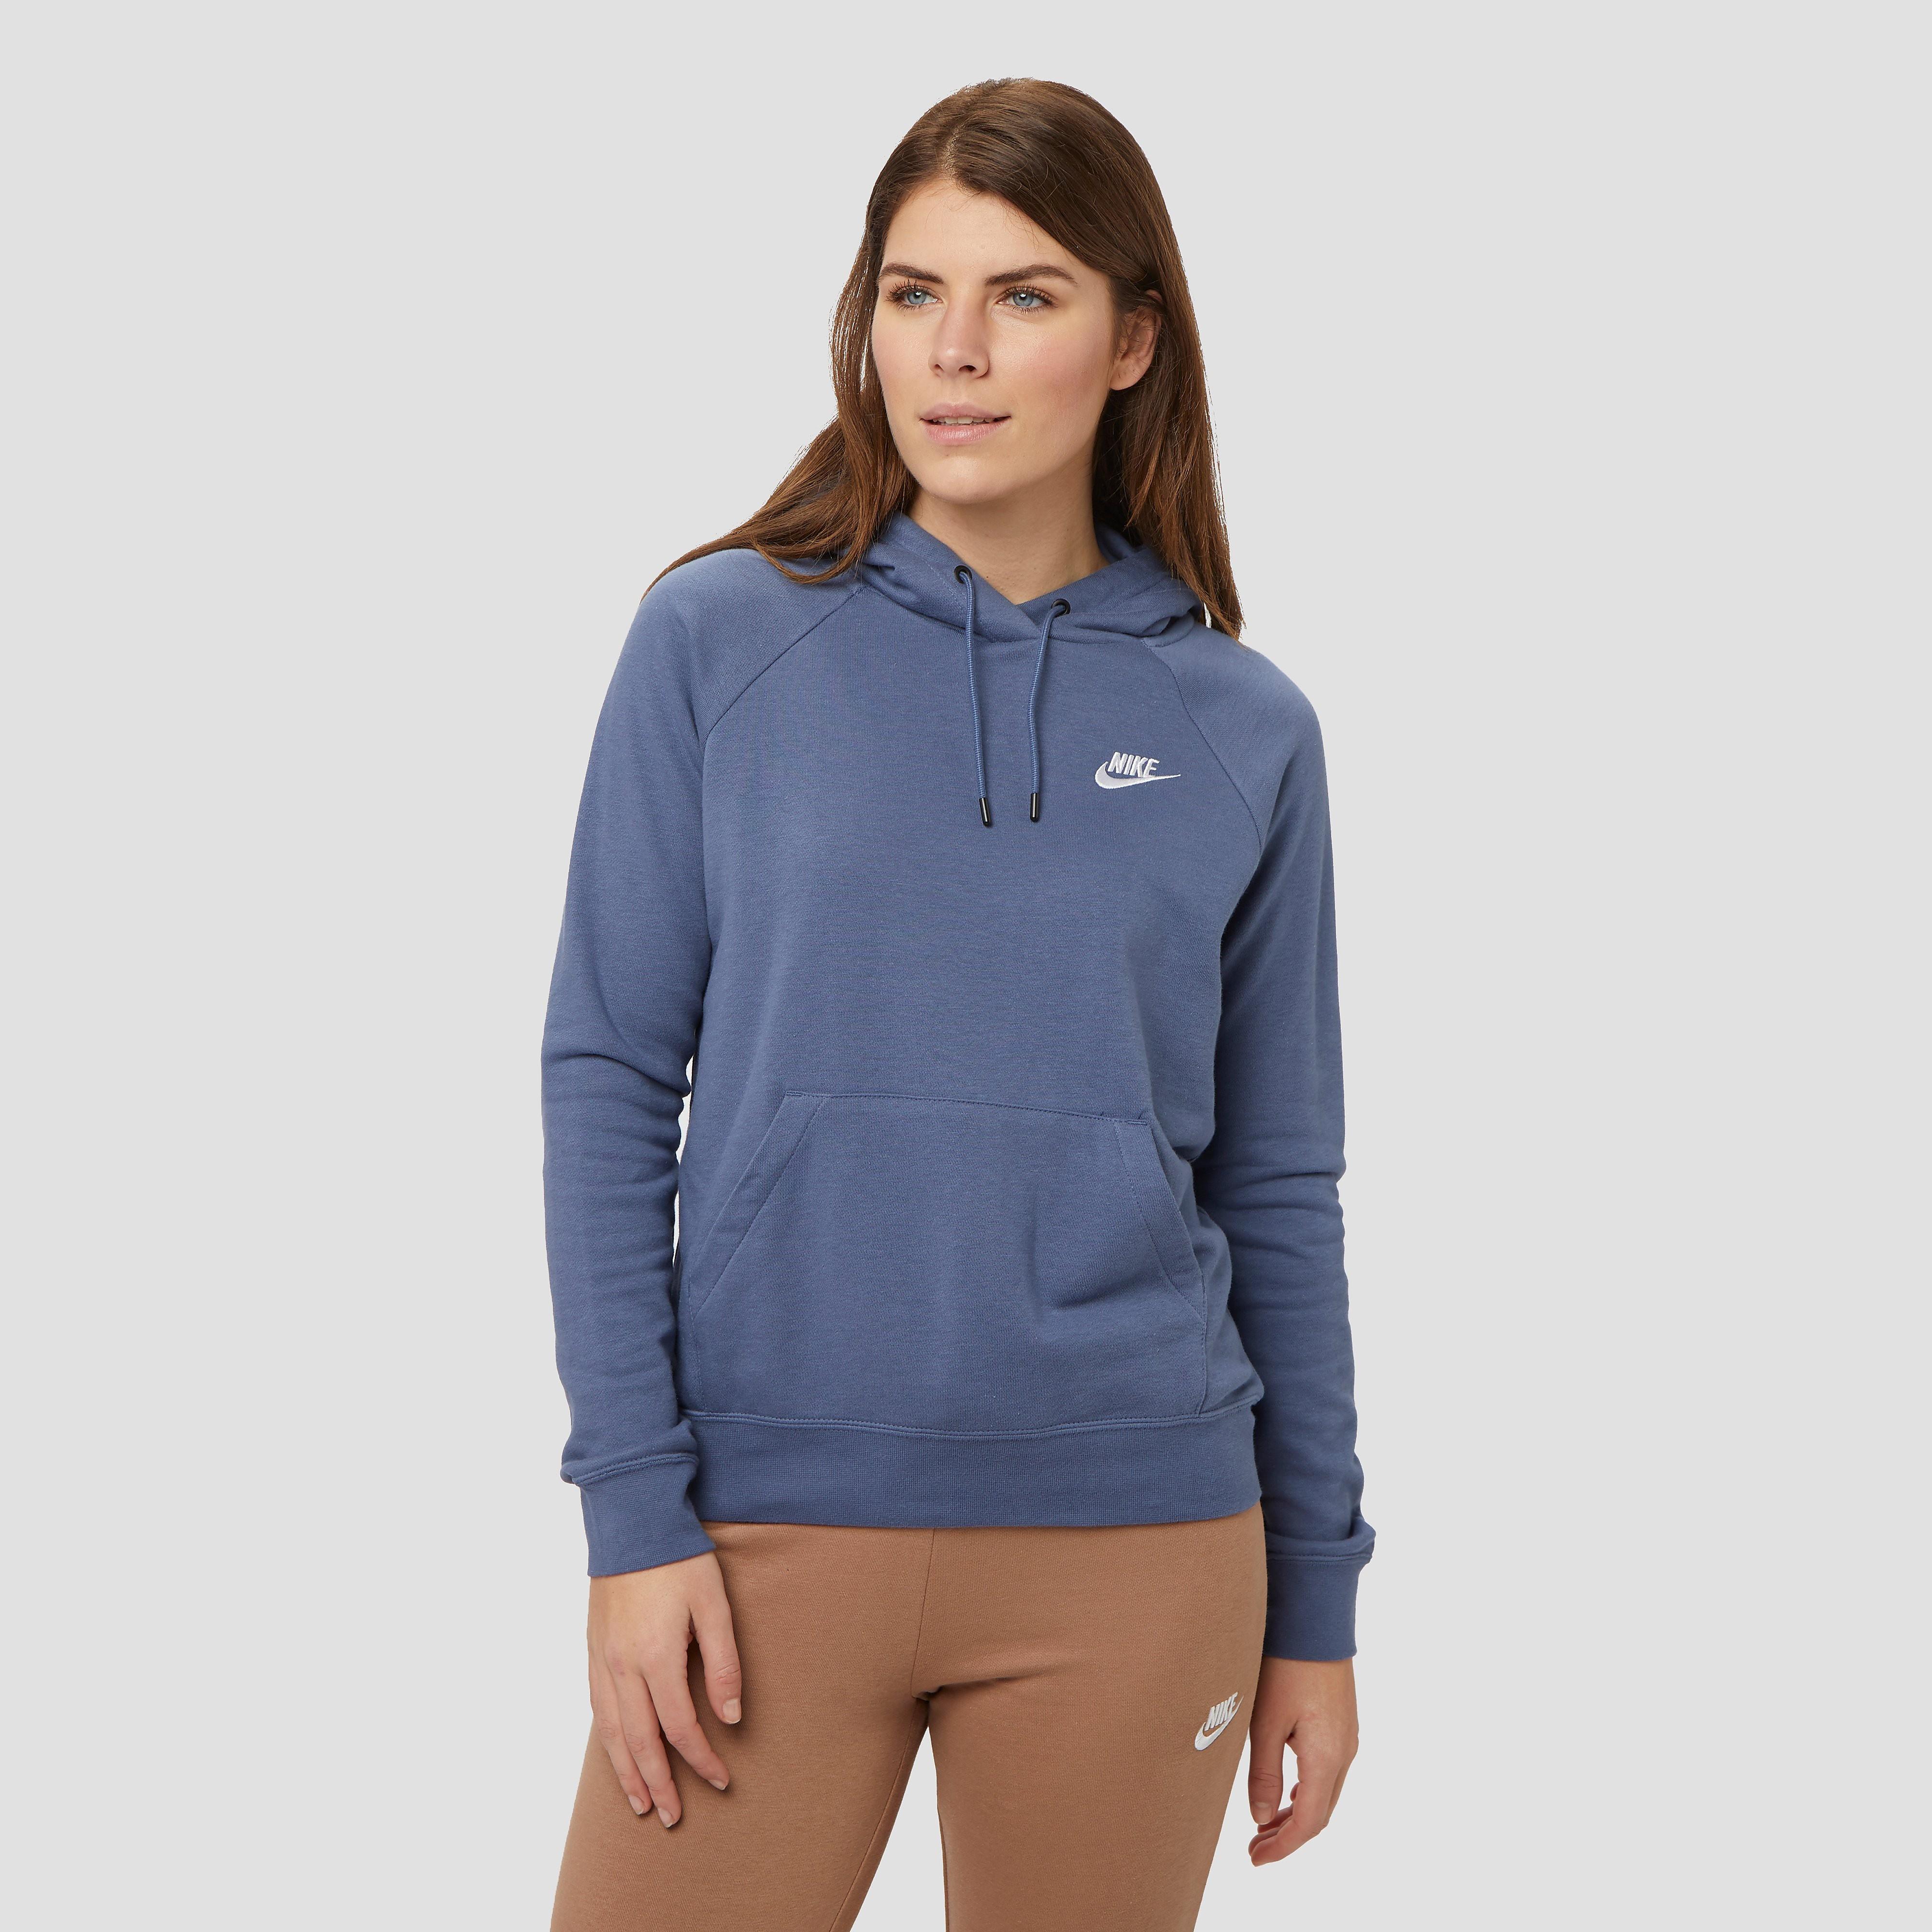 NIKE Sportswear essential trui paars/blauw dames Dames